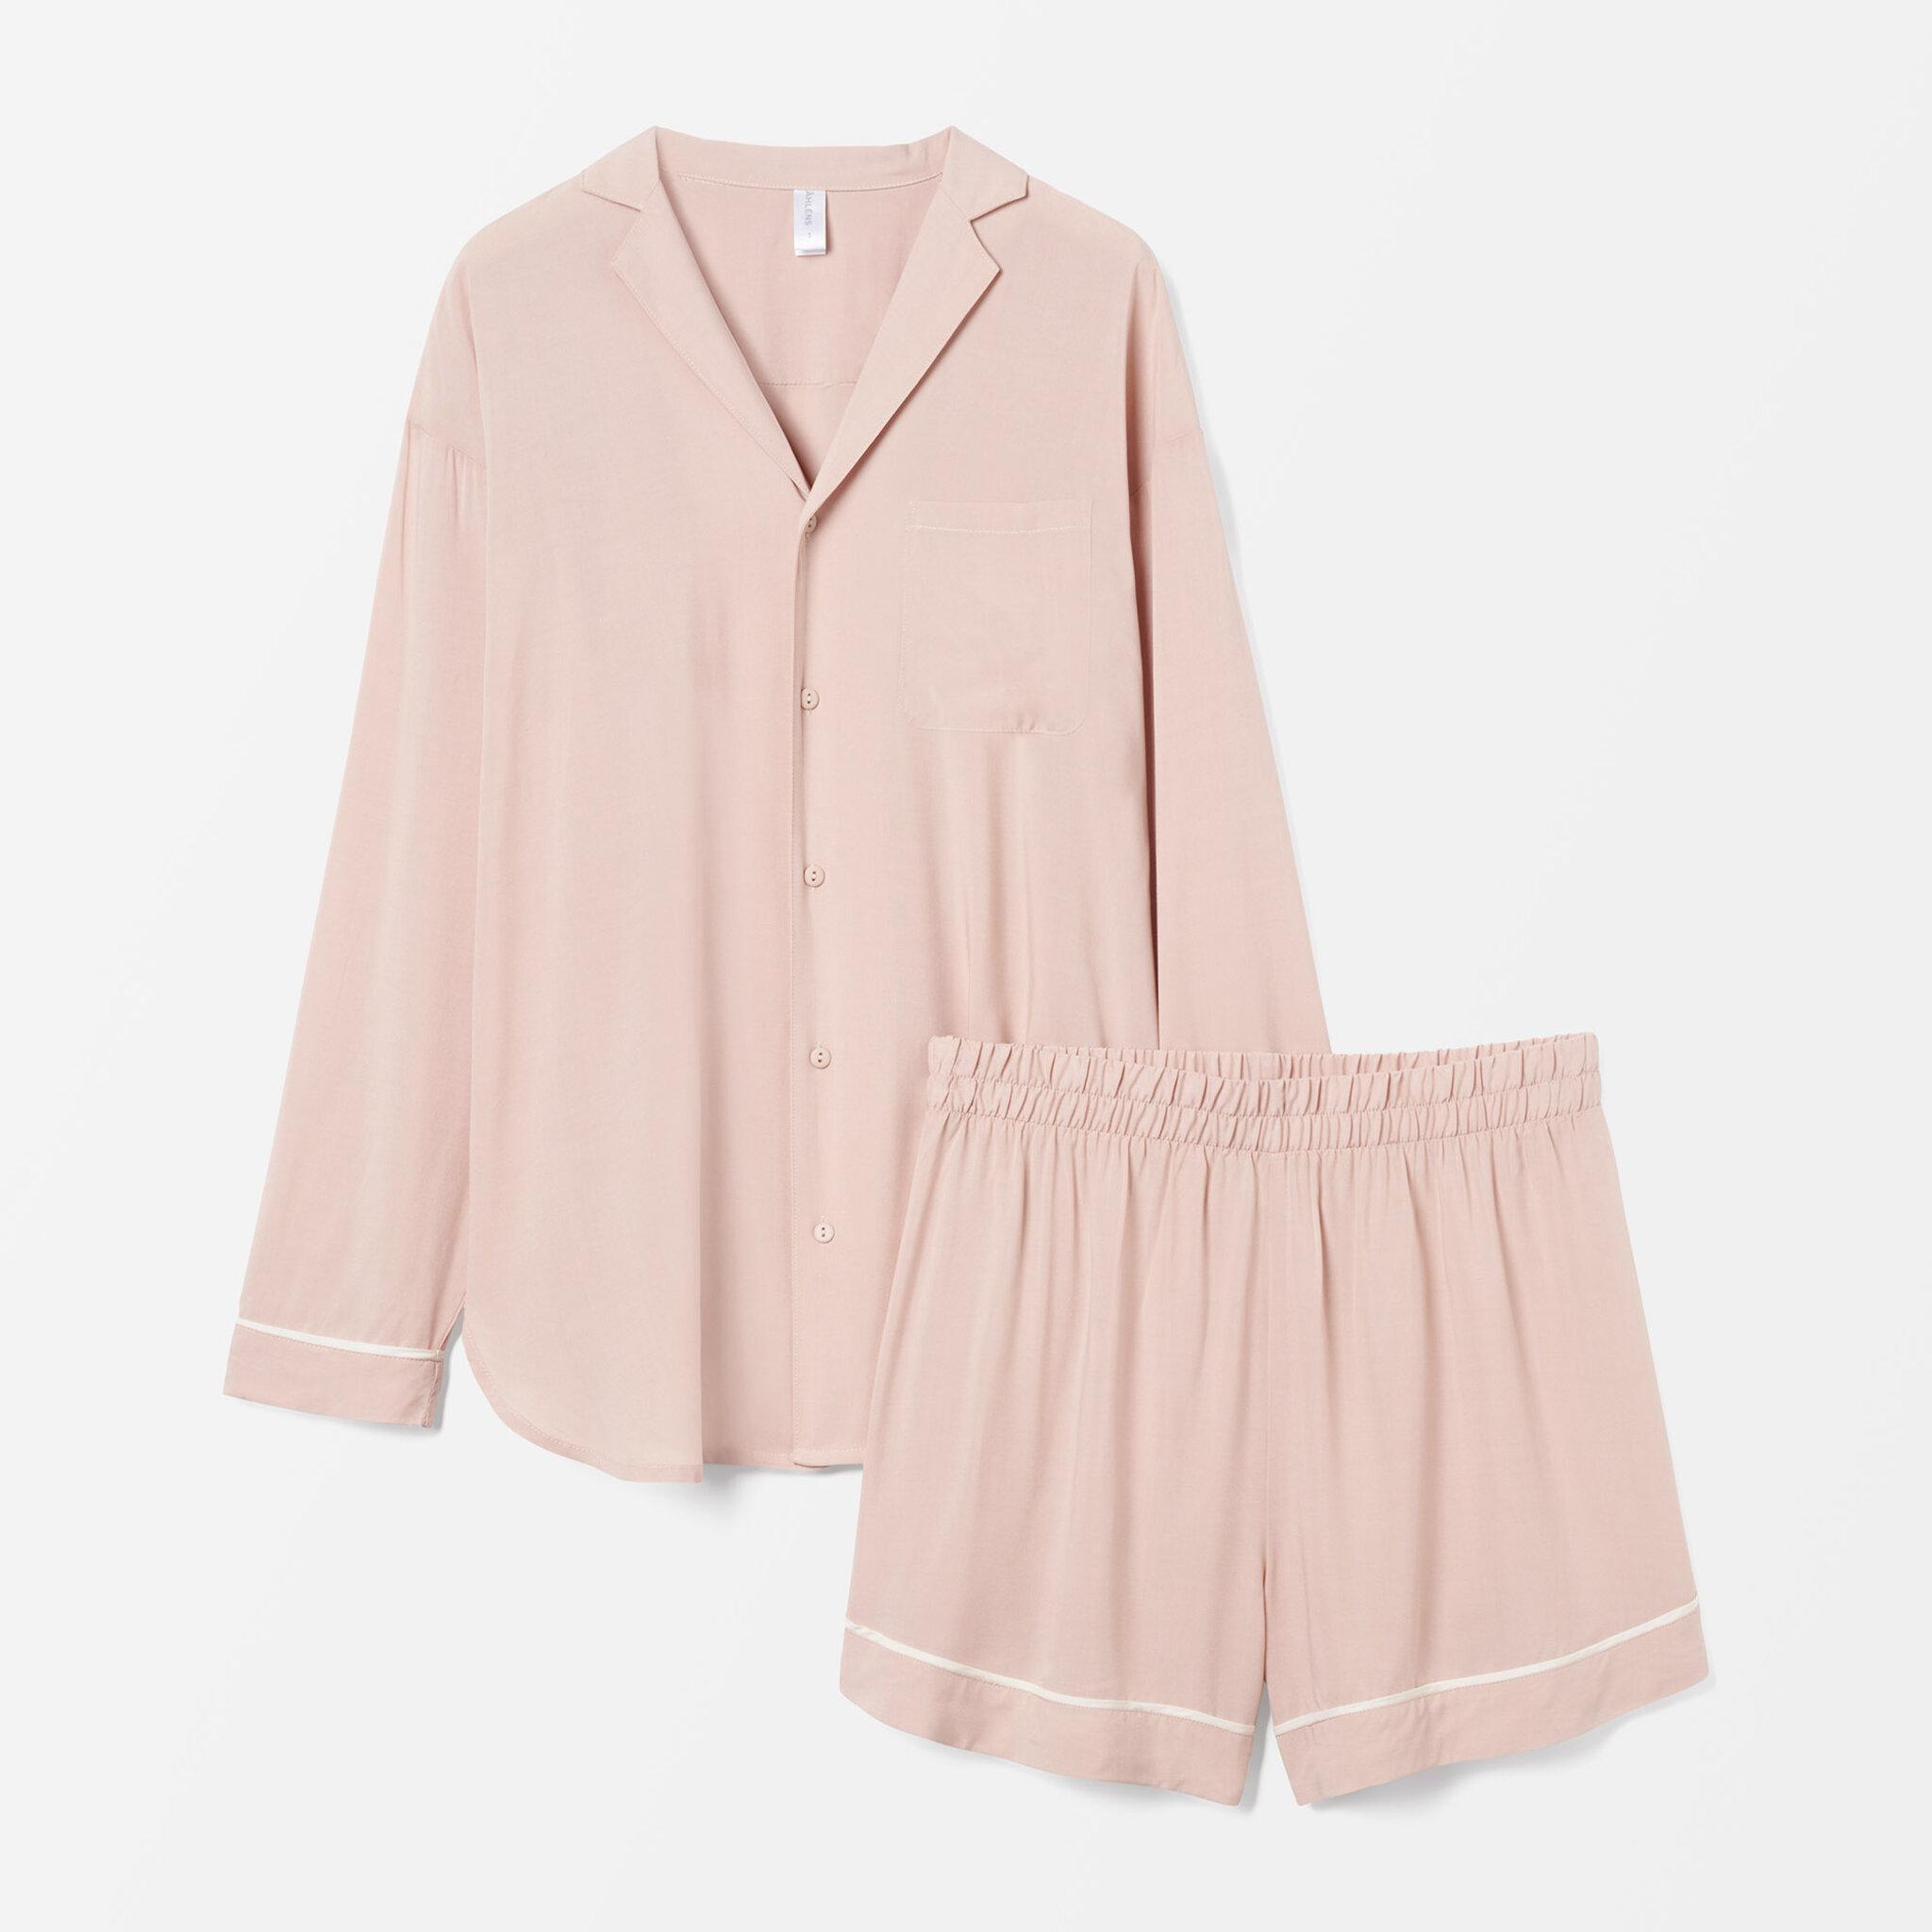 2-delat pyjamasset